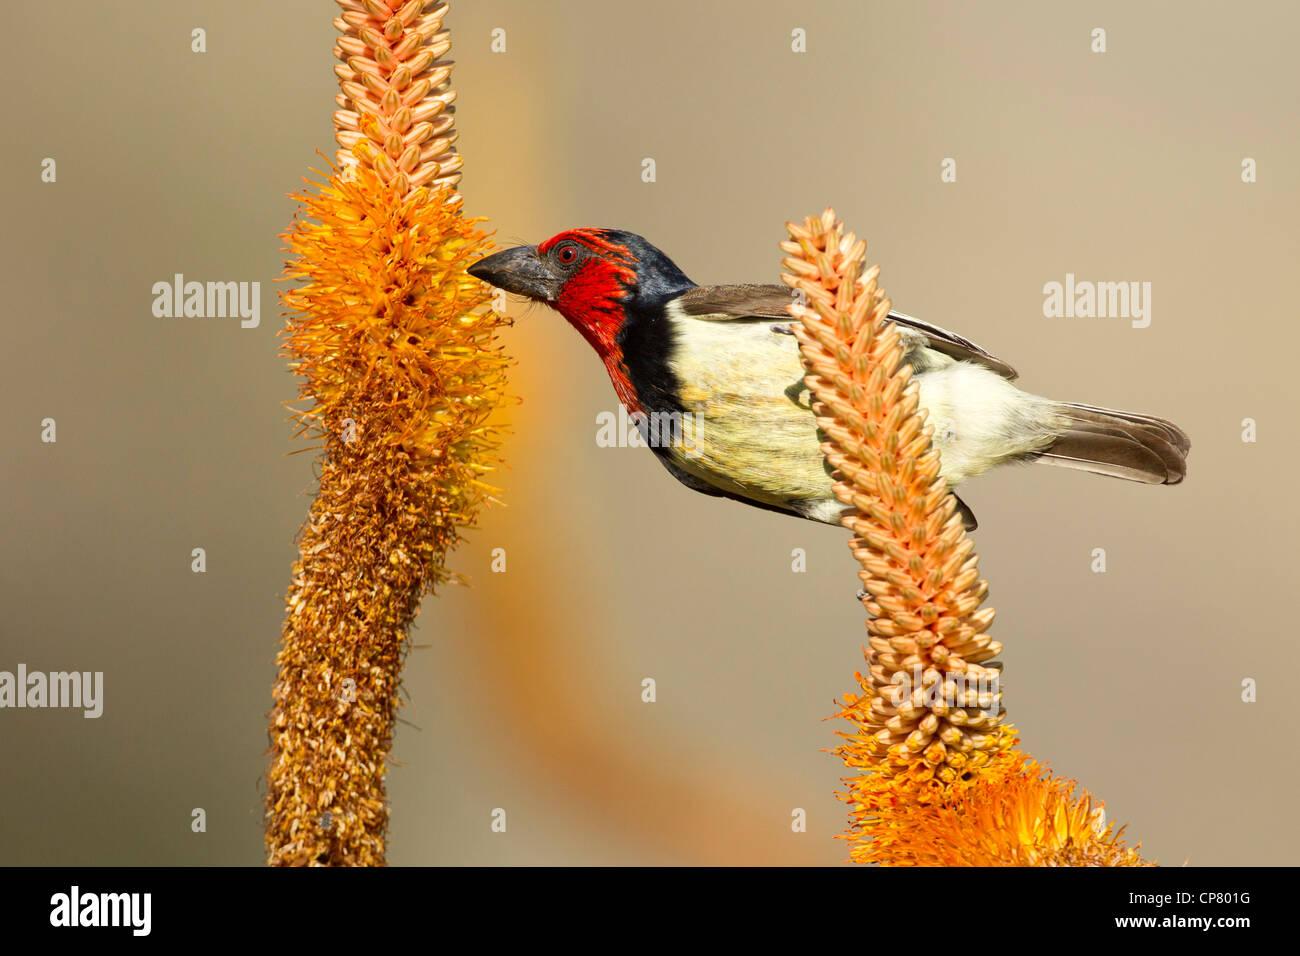 Collare nero Barbet (Lybius torquatus) alimentare il nettare dei fiori di Aloe, Kruger Park, Sud Africa Immagini Stock